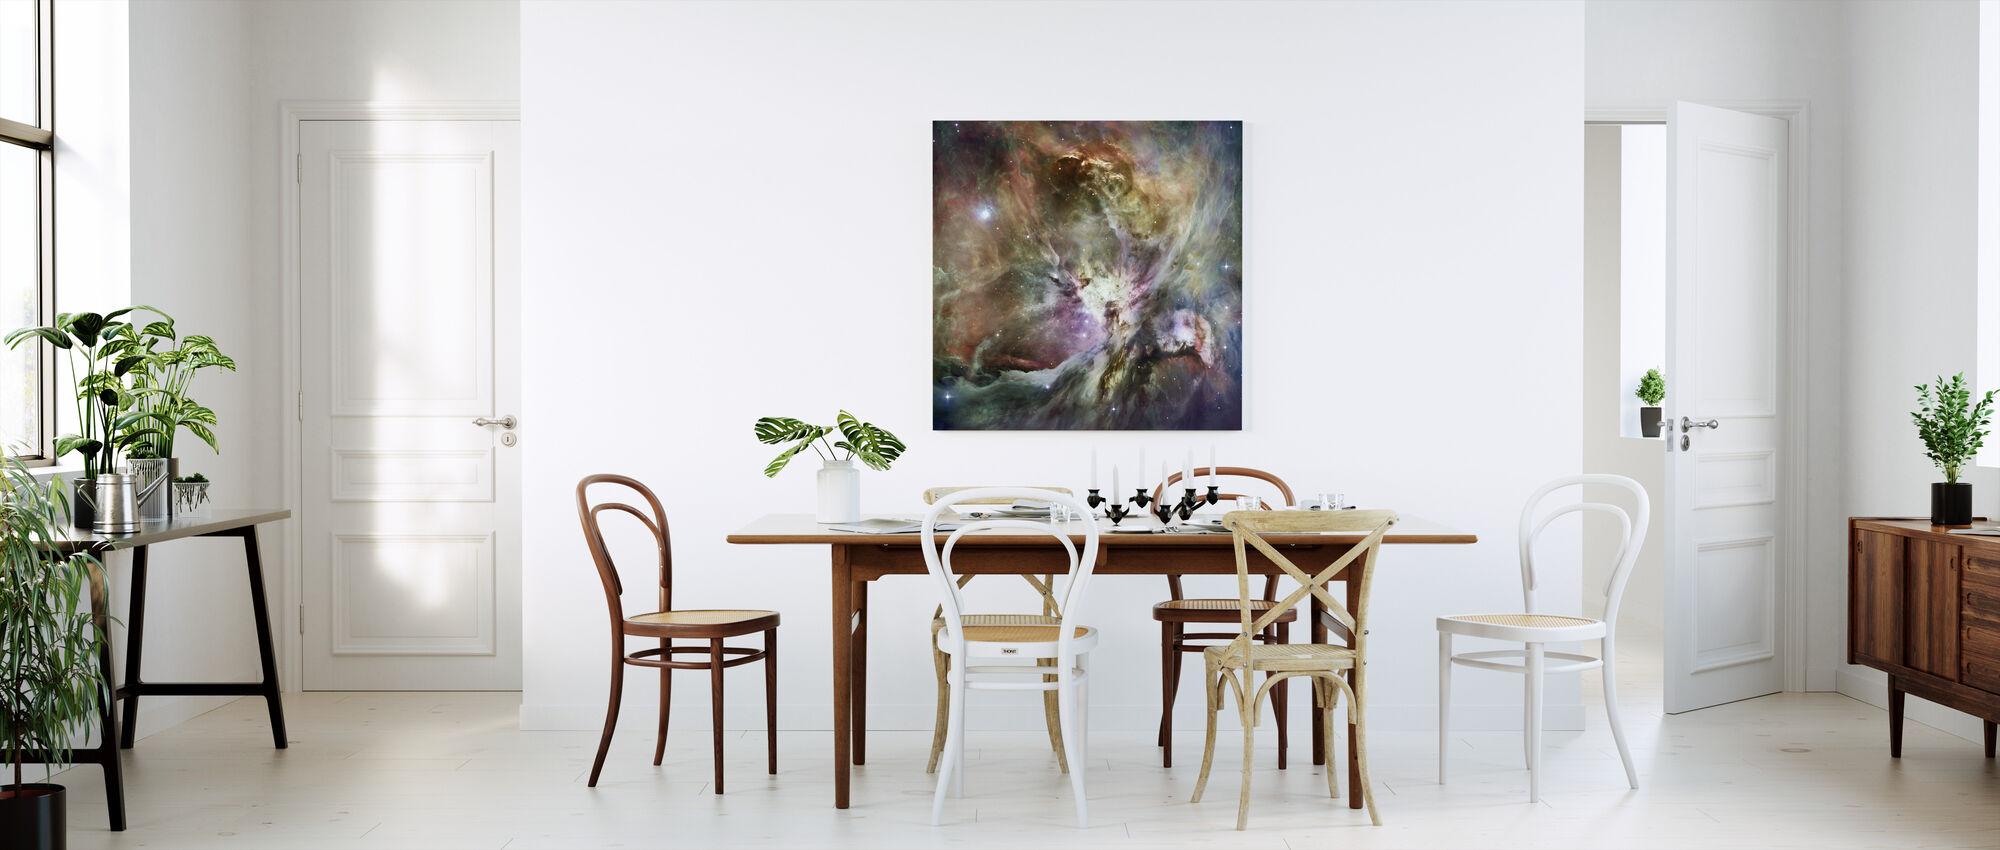 Orion Nebula - Canvas print - Kitchen